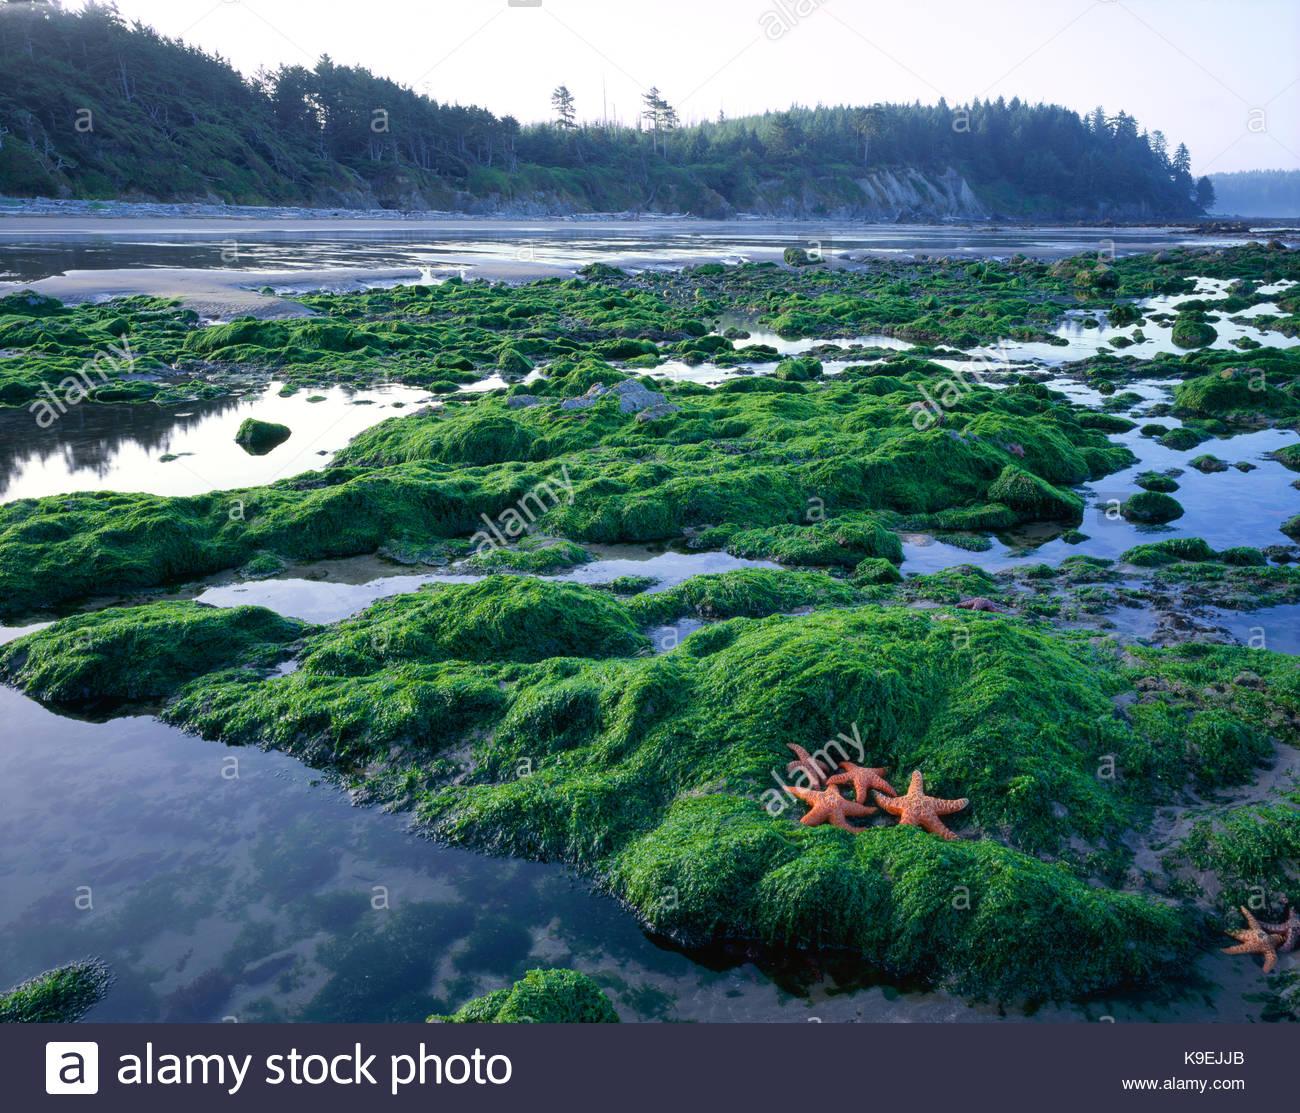 Sea Stars and Tide Pools, Olympic National Park, Washington Stock Photo